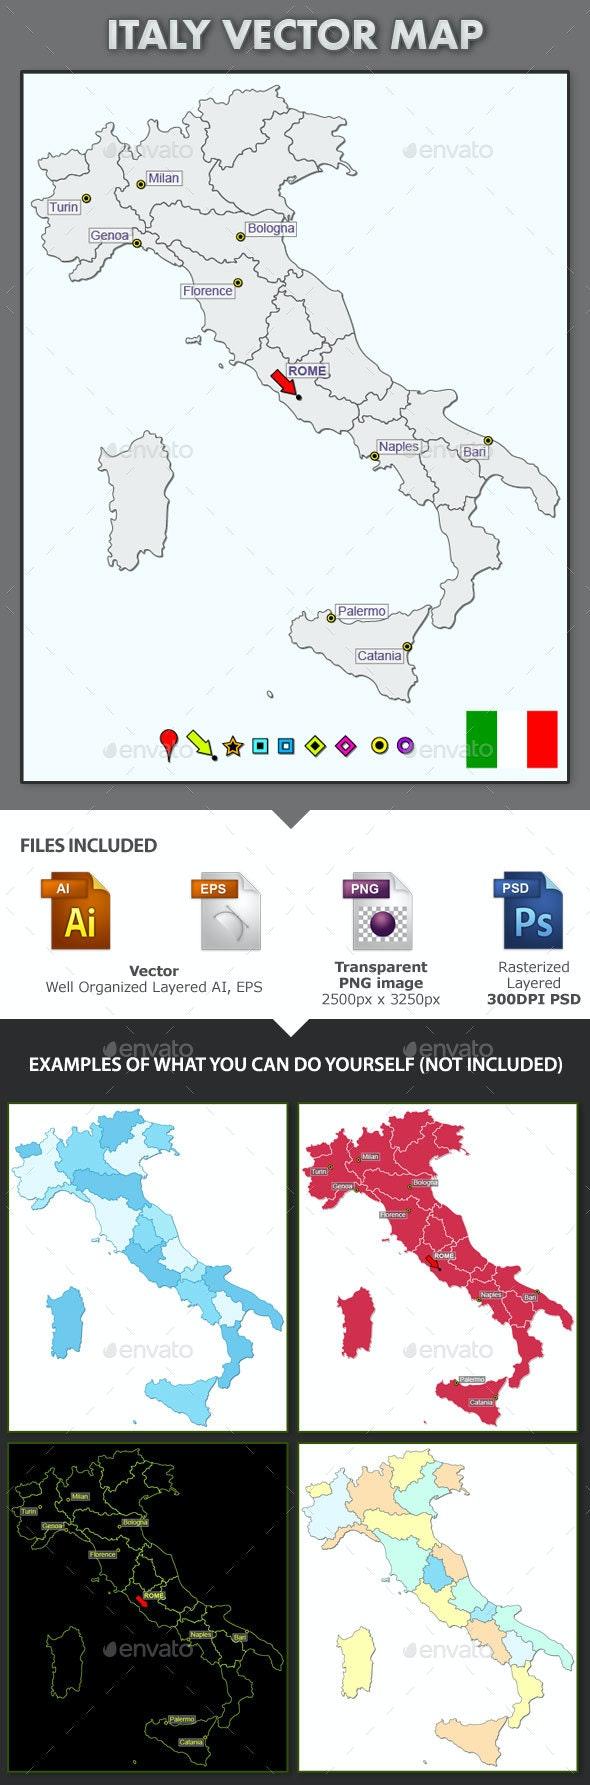 Italy Layered Map - Web Elements Vectors